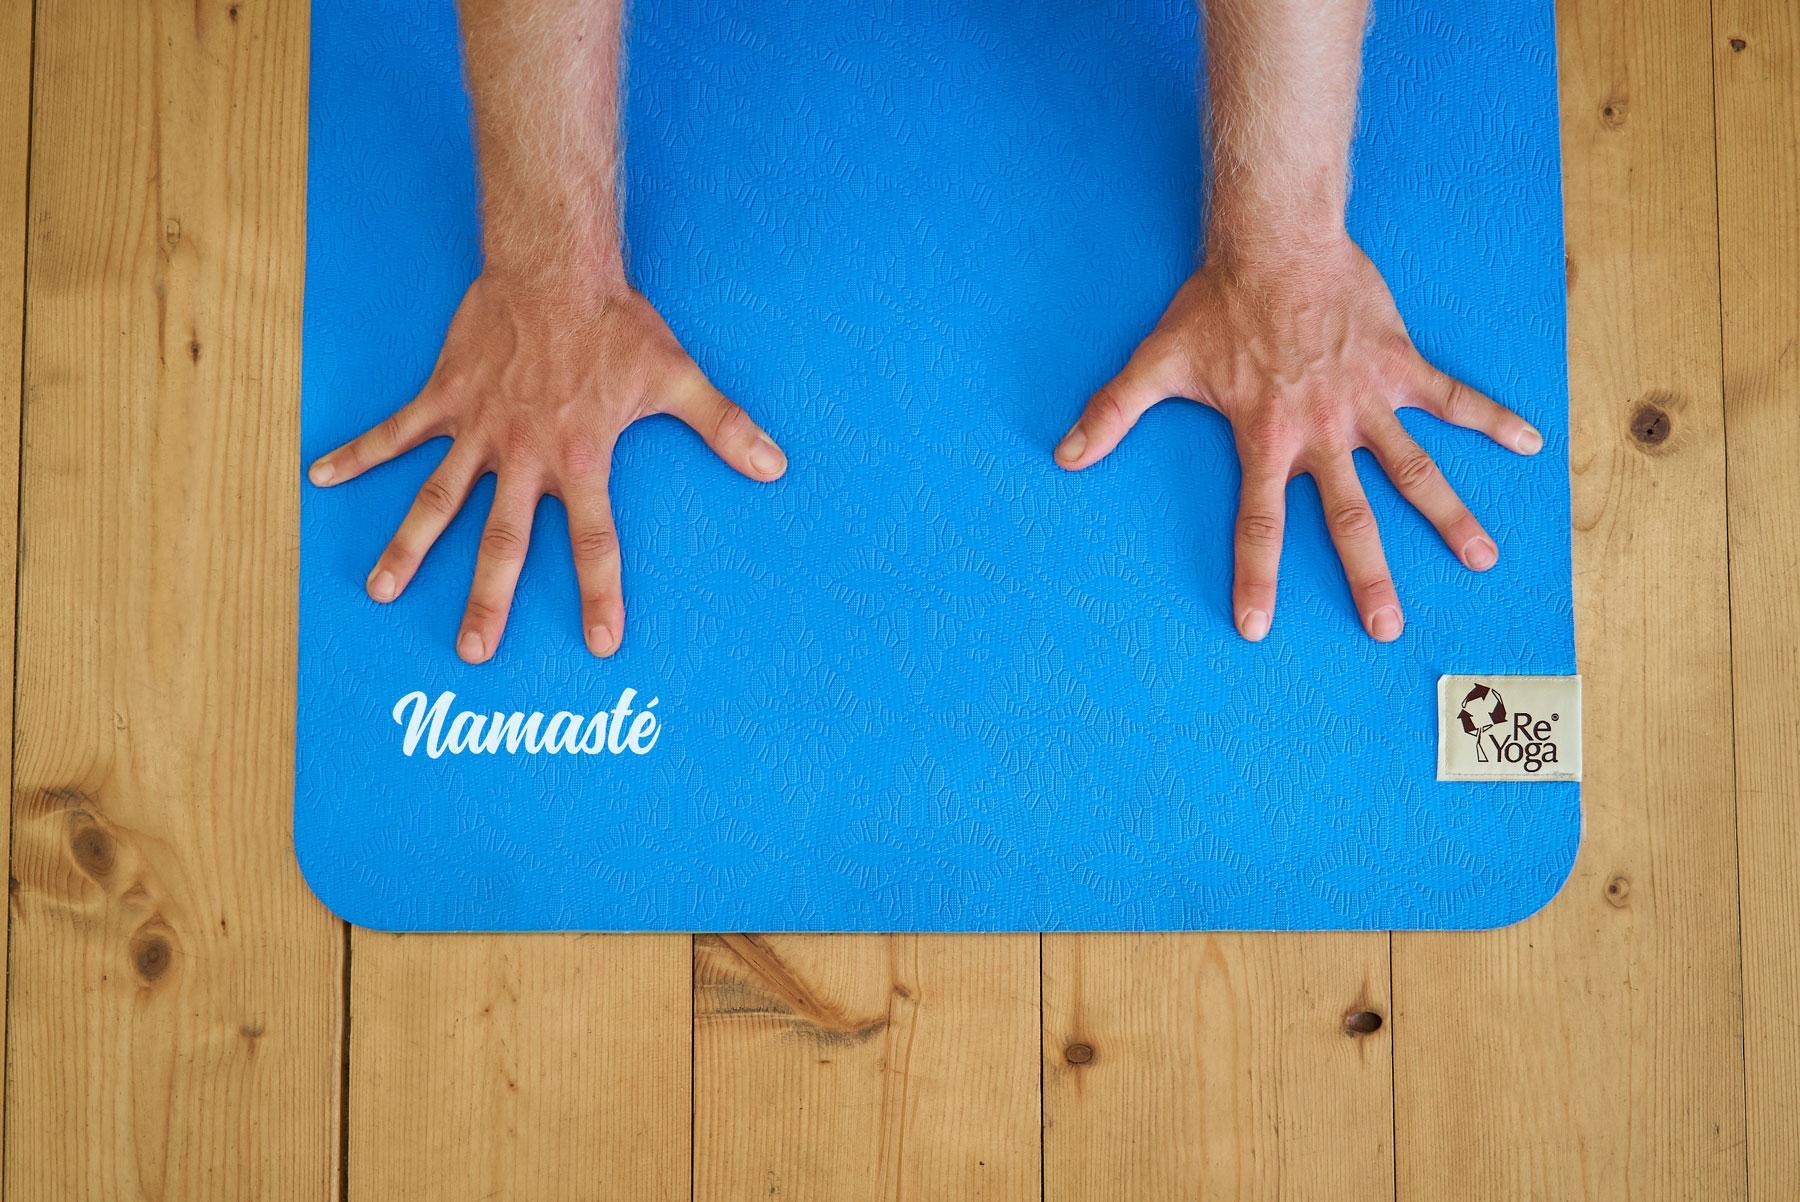 Tappetini yoga personalizzati reyoga